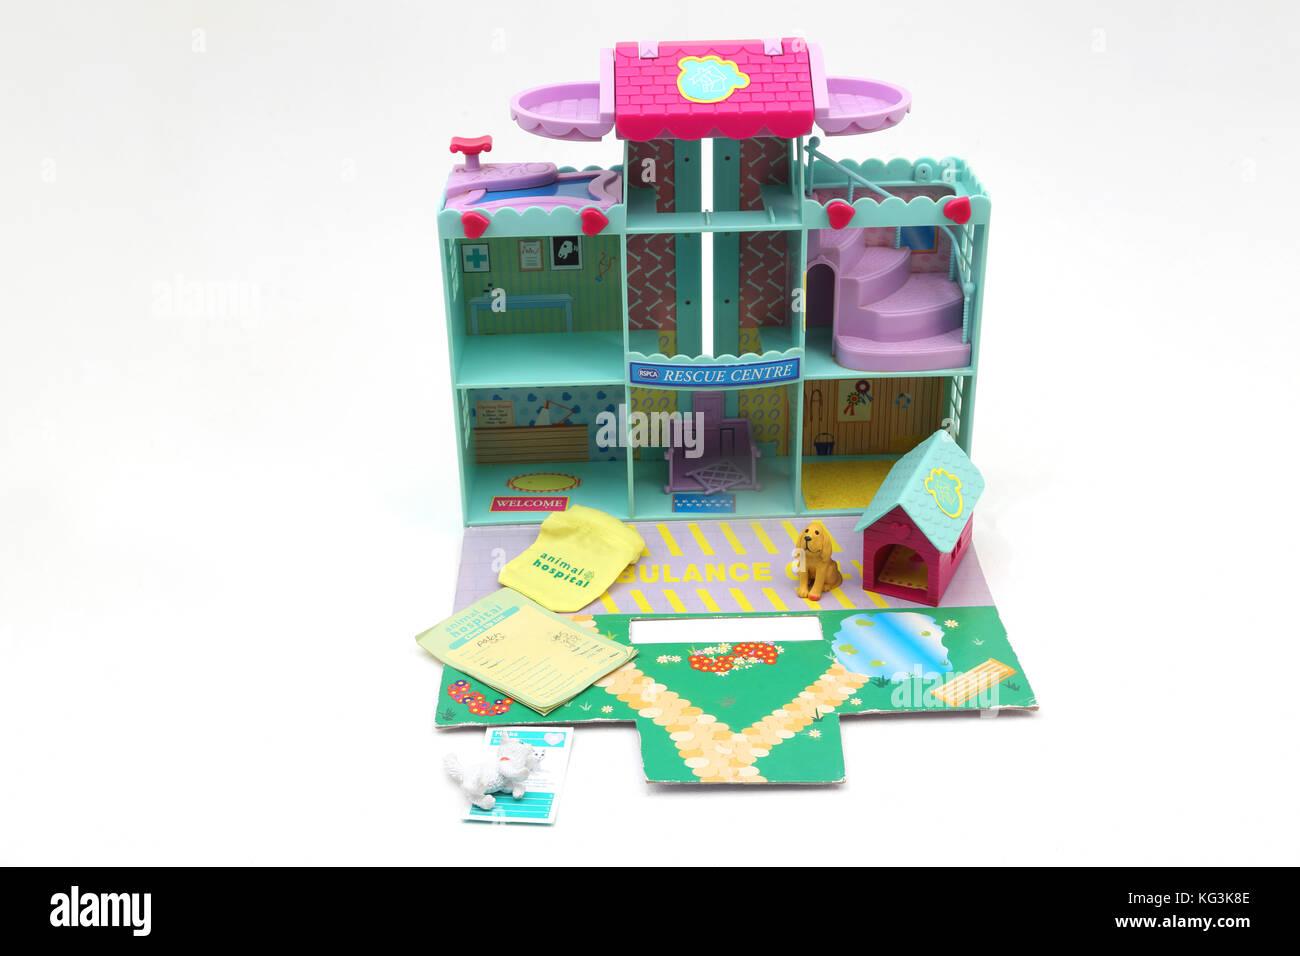 Vintage 1990's Toy BBC RSPCA Animal Hospital Rescue Centre - Stock Image